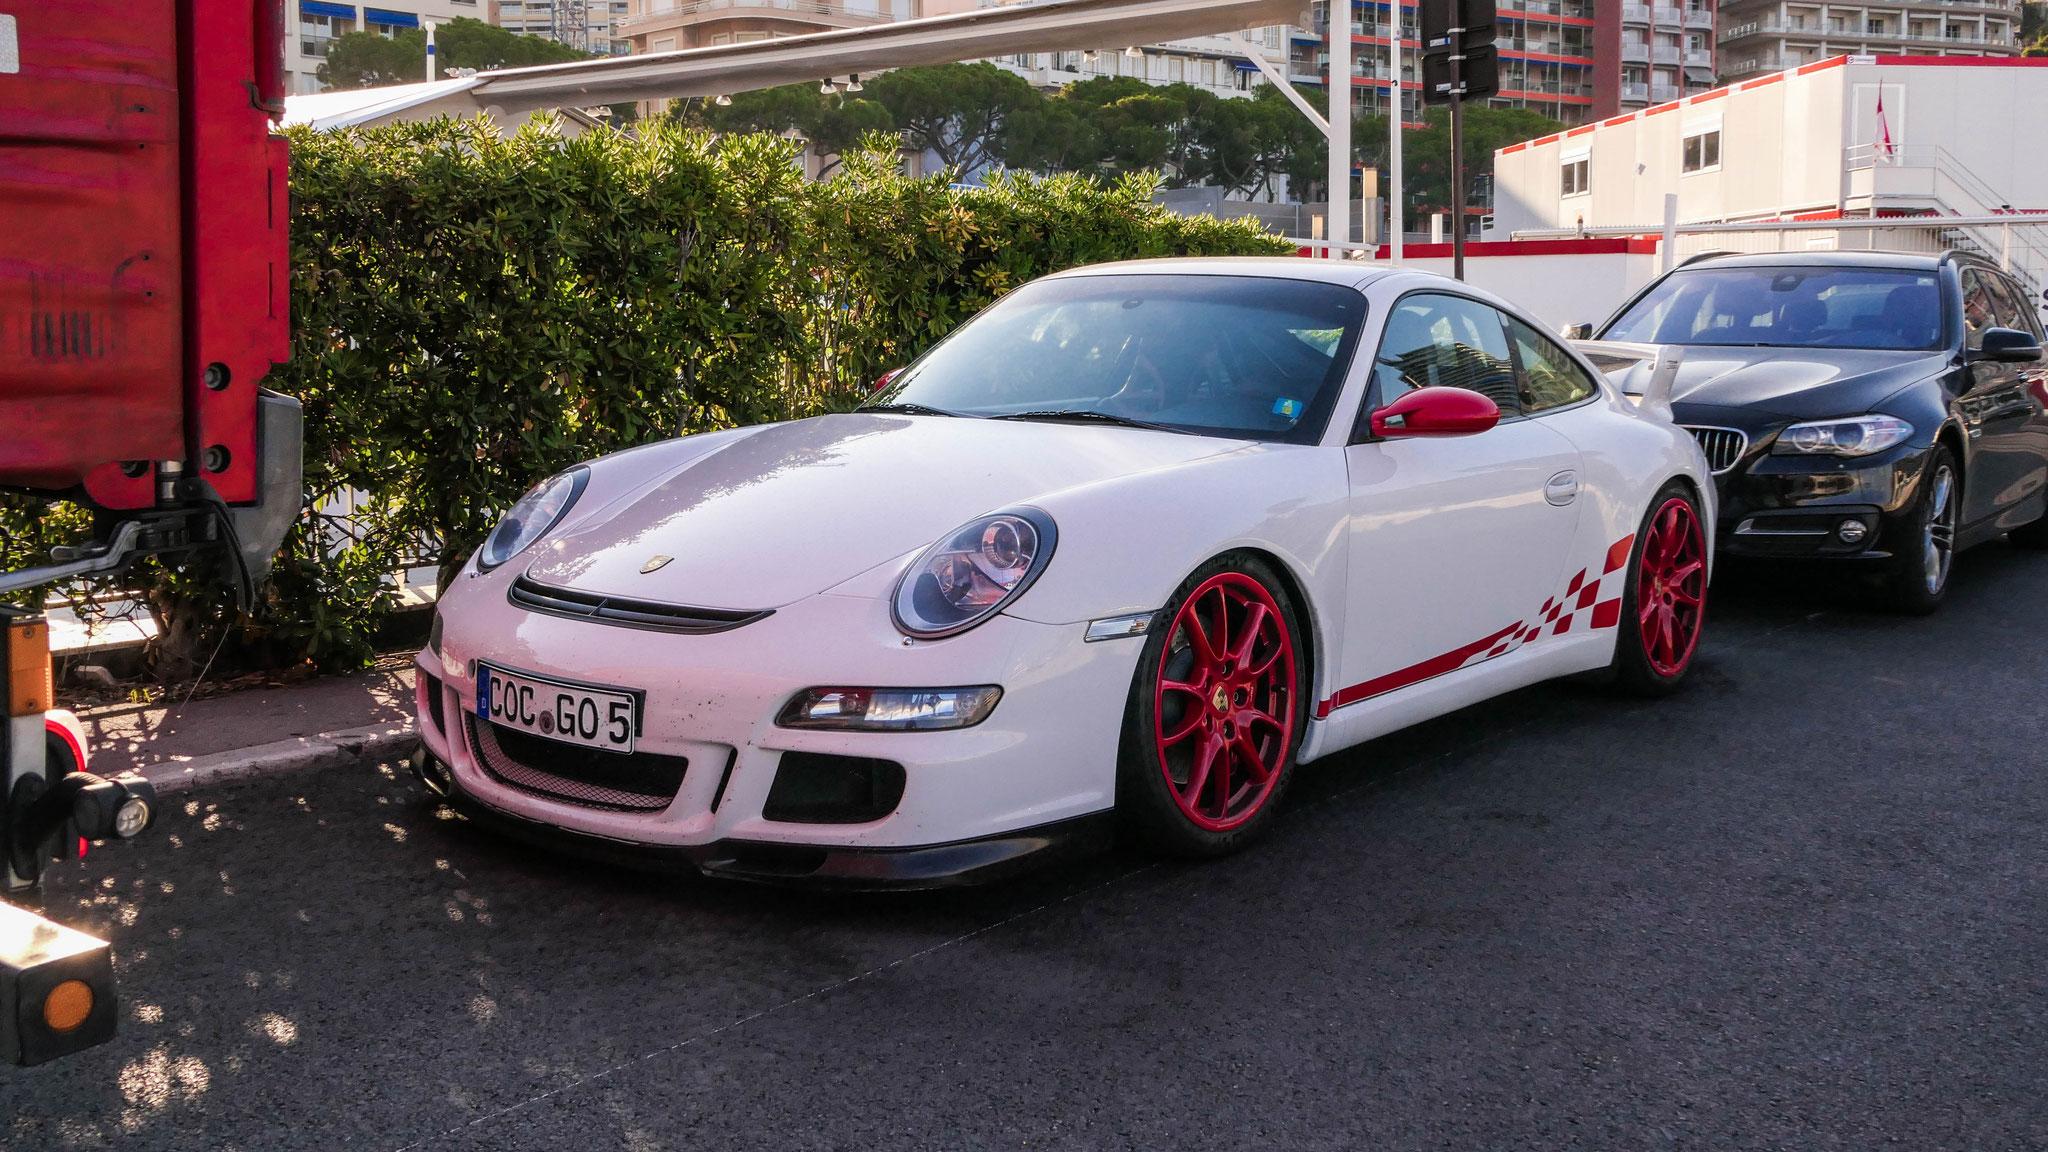 Porsche GT3 997 - COC-GO-5